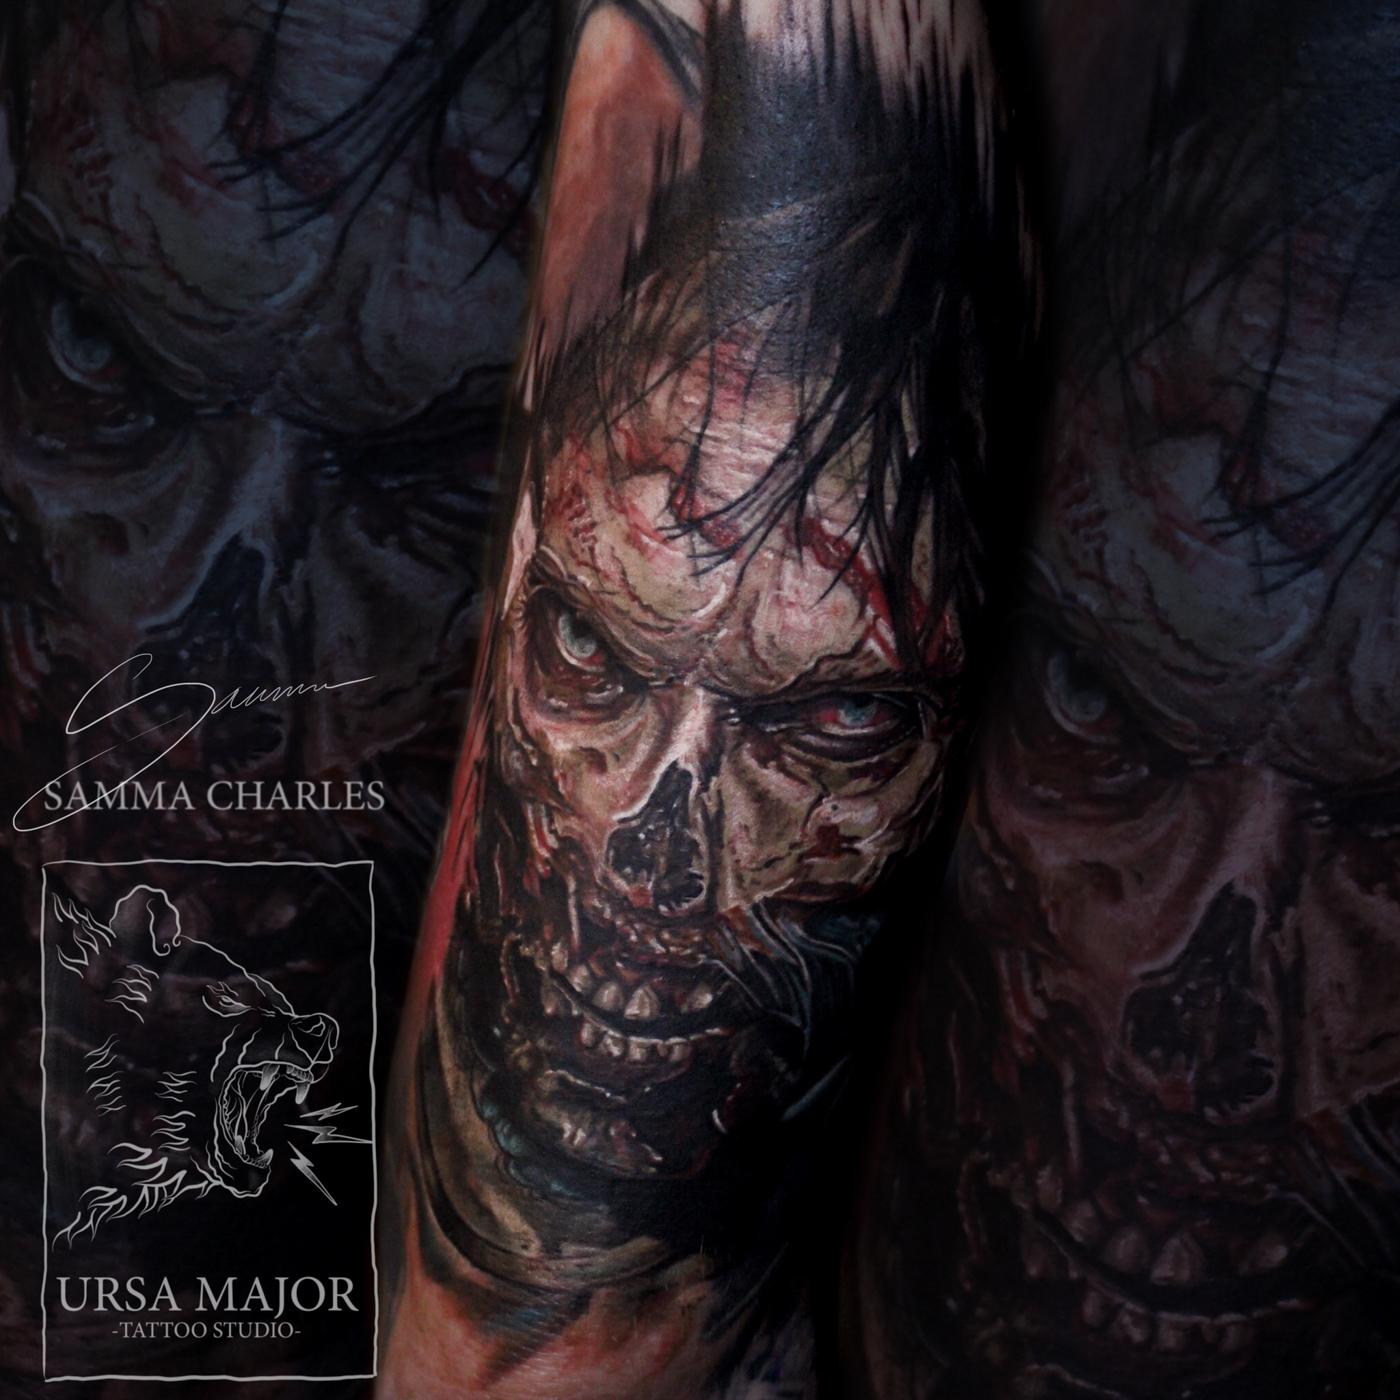 oxfordshire-tattoo-studio-34.jpg